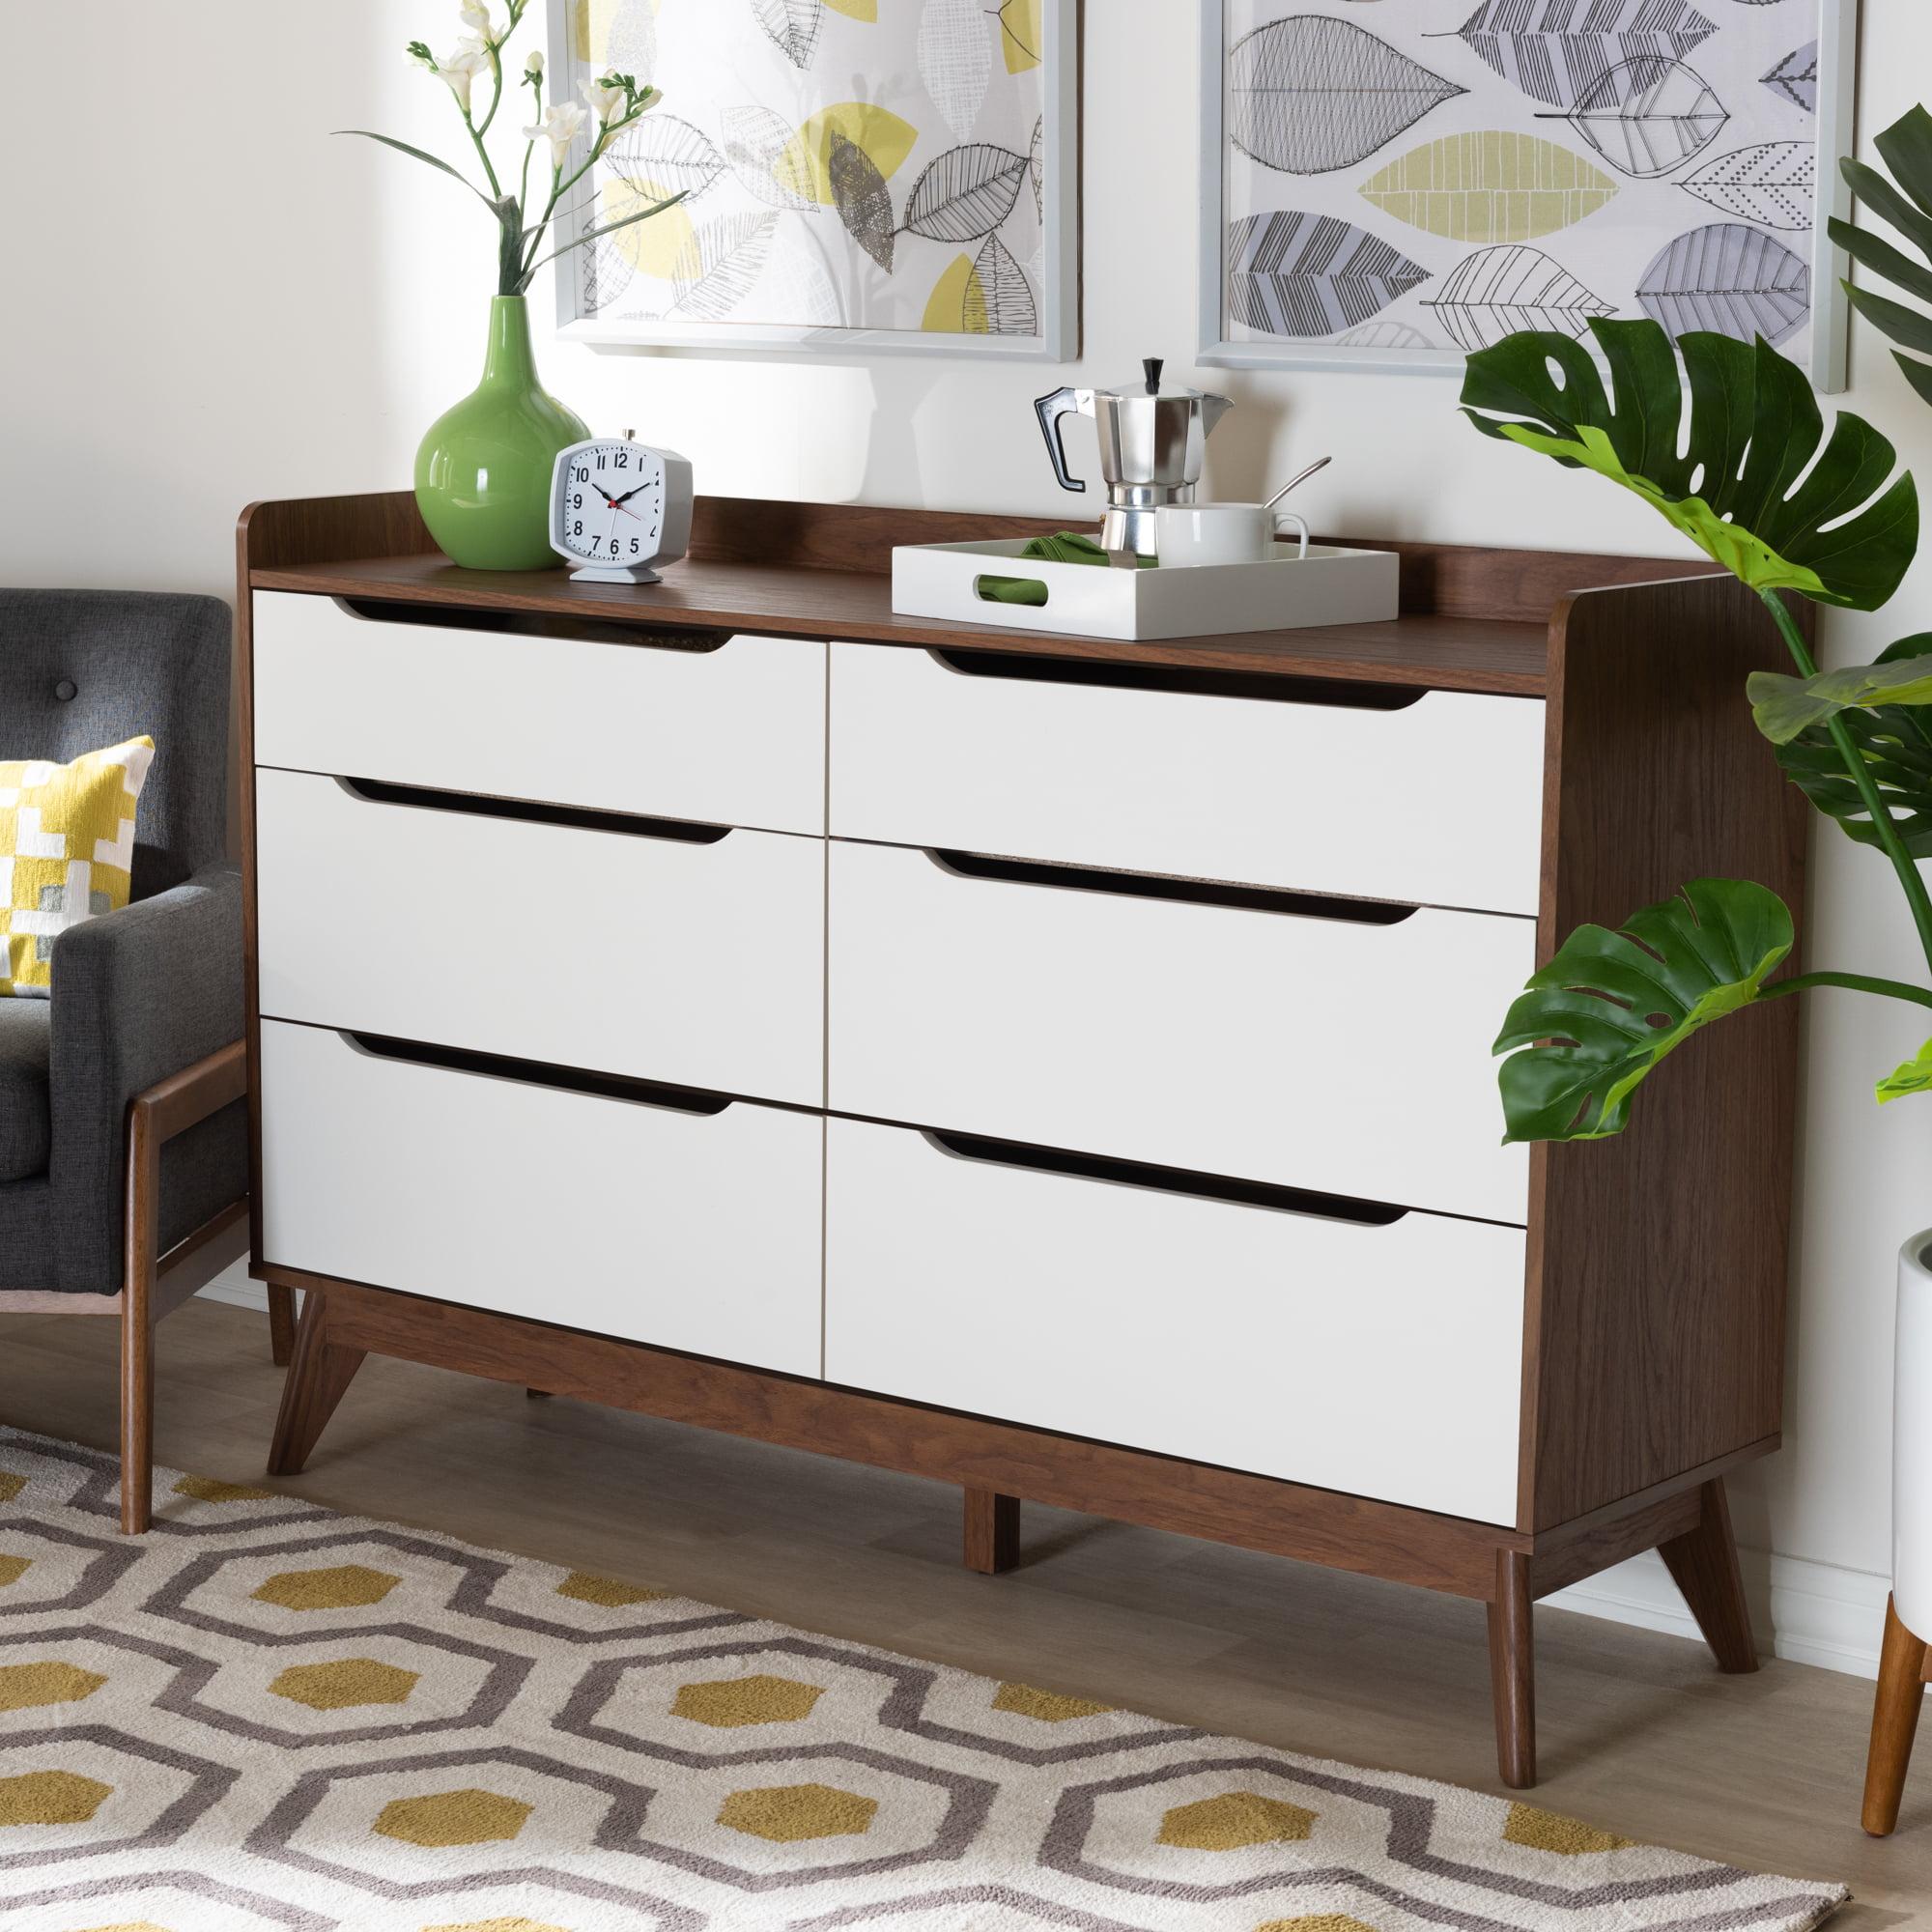 Benton 6 Drawer Storage Dresser by Bellamy Studios